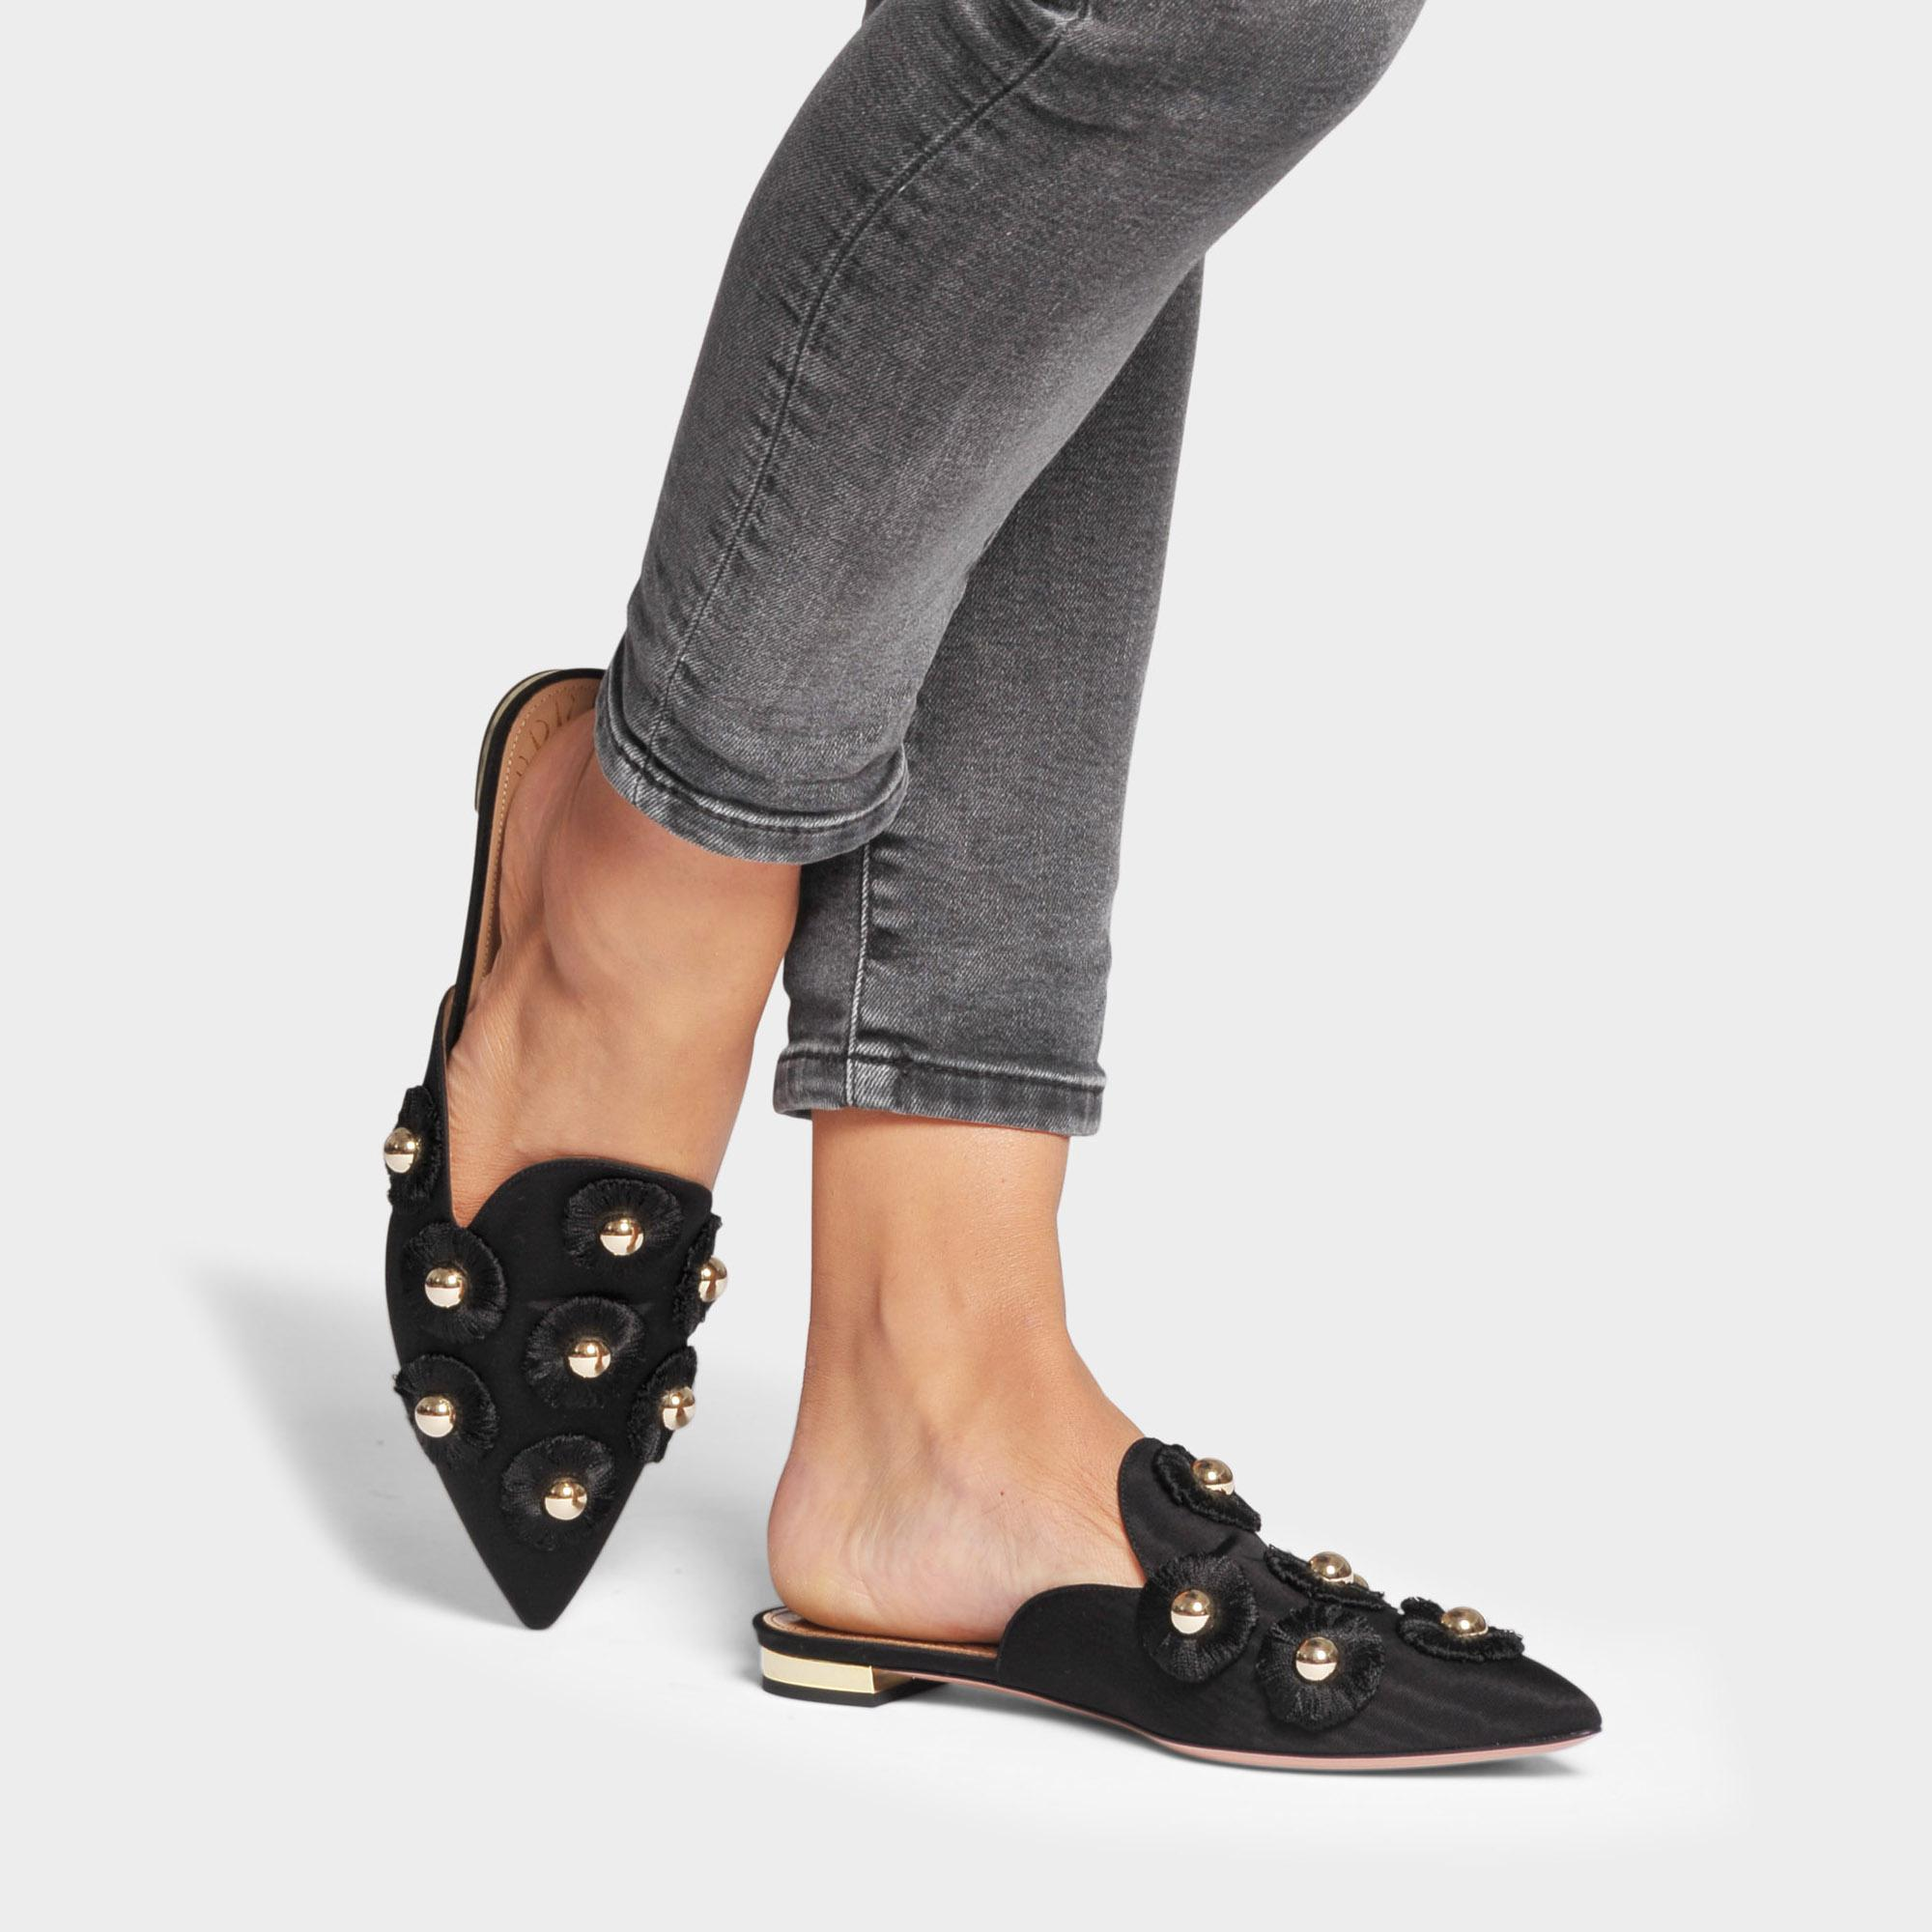 7bac858378d52 aquazzura--Sunflower-Flat-Shoes-In-Black-Moire-Fabric.jpeg